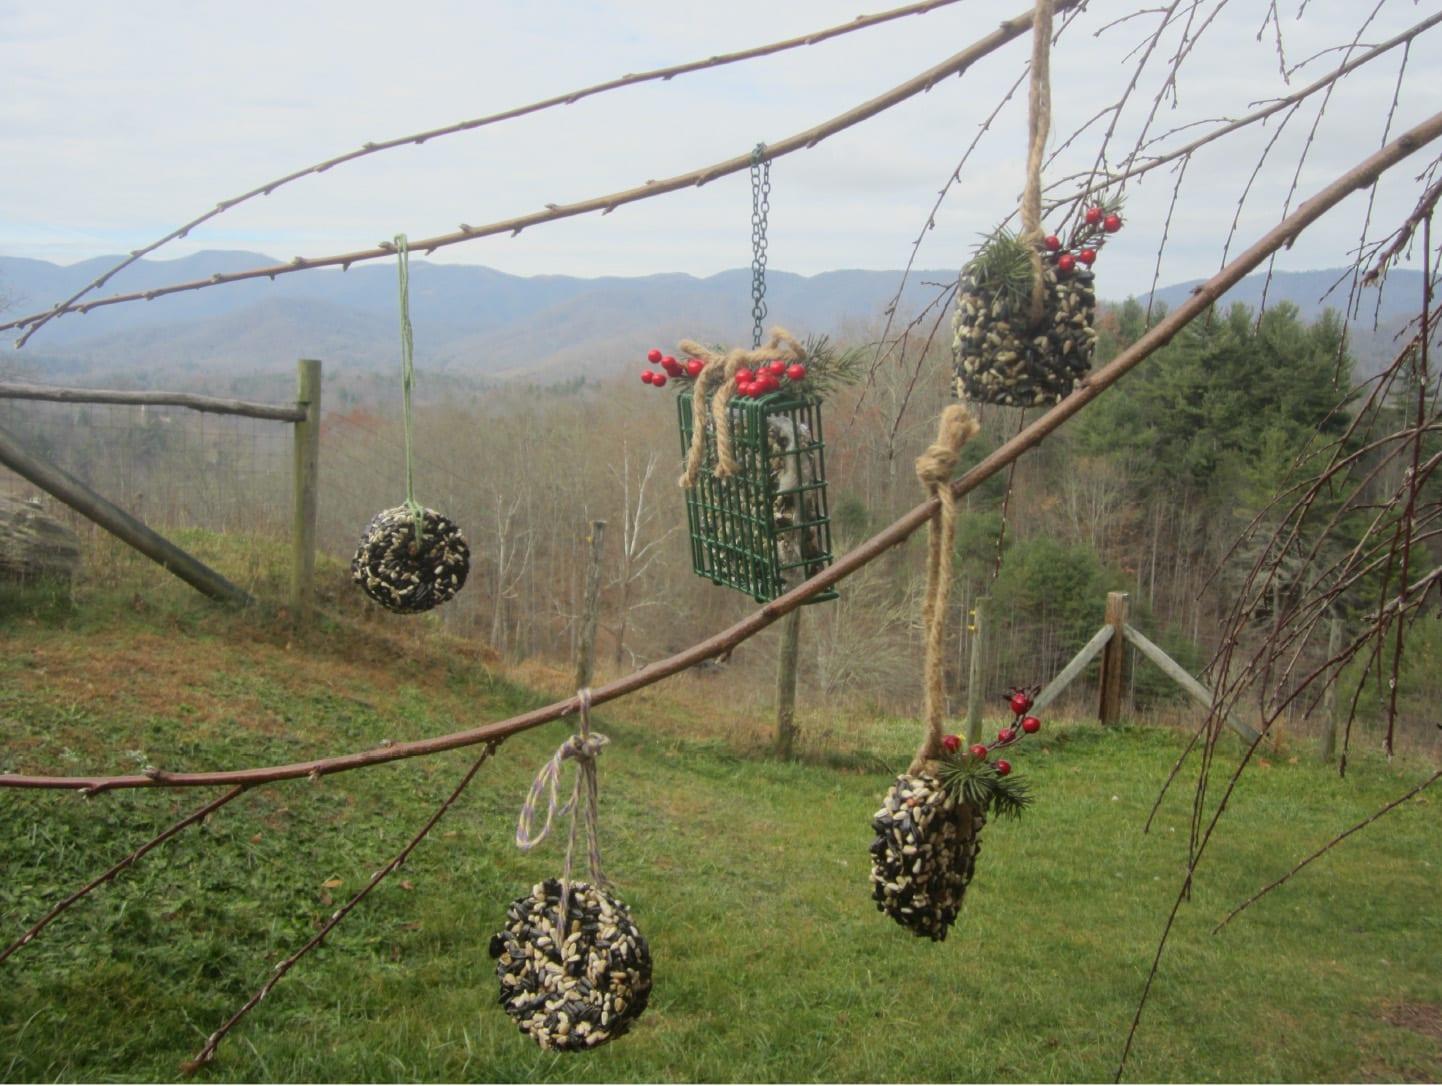 Mountain Lady Farm Project – Bird Feed Cakes